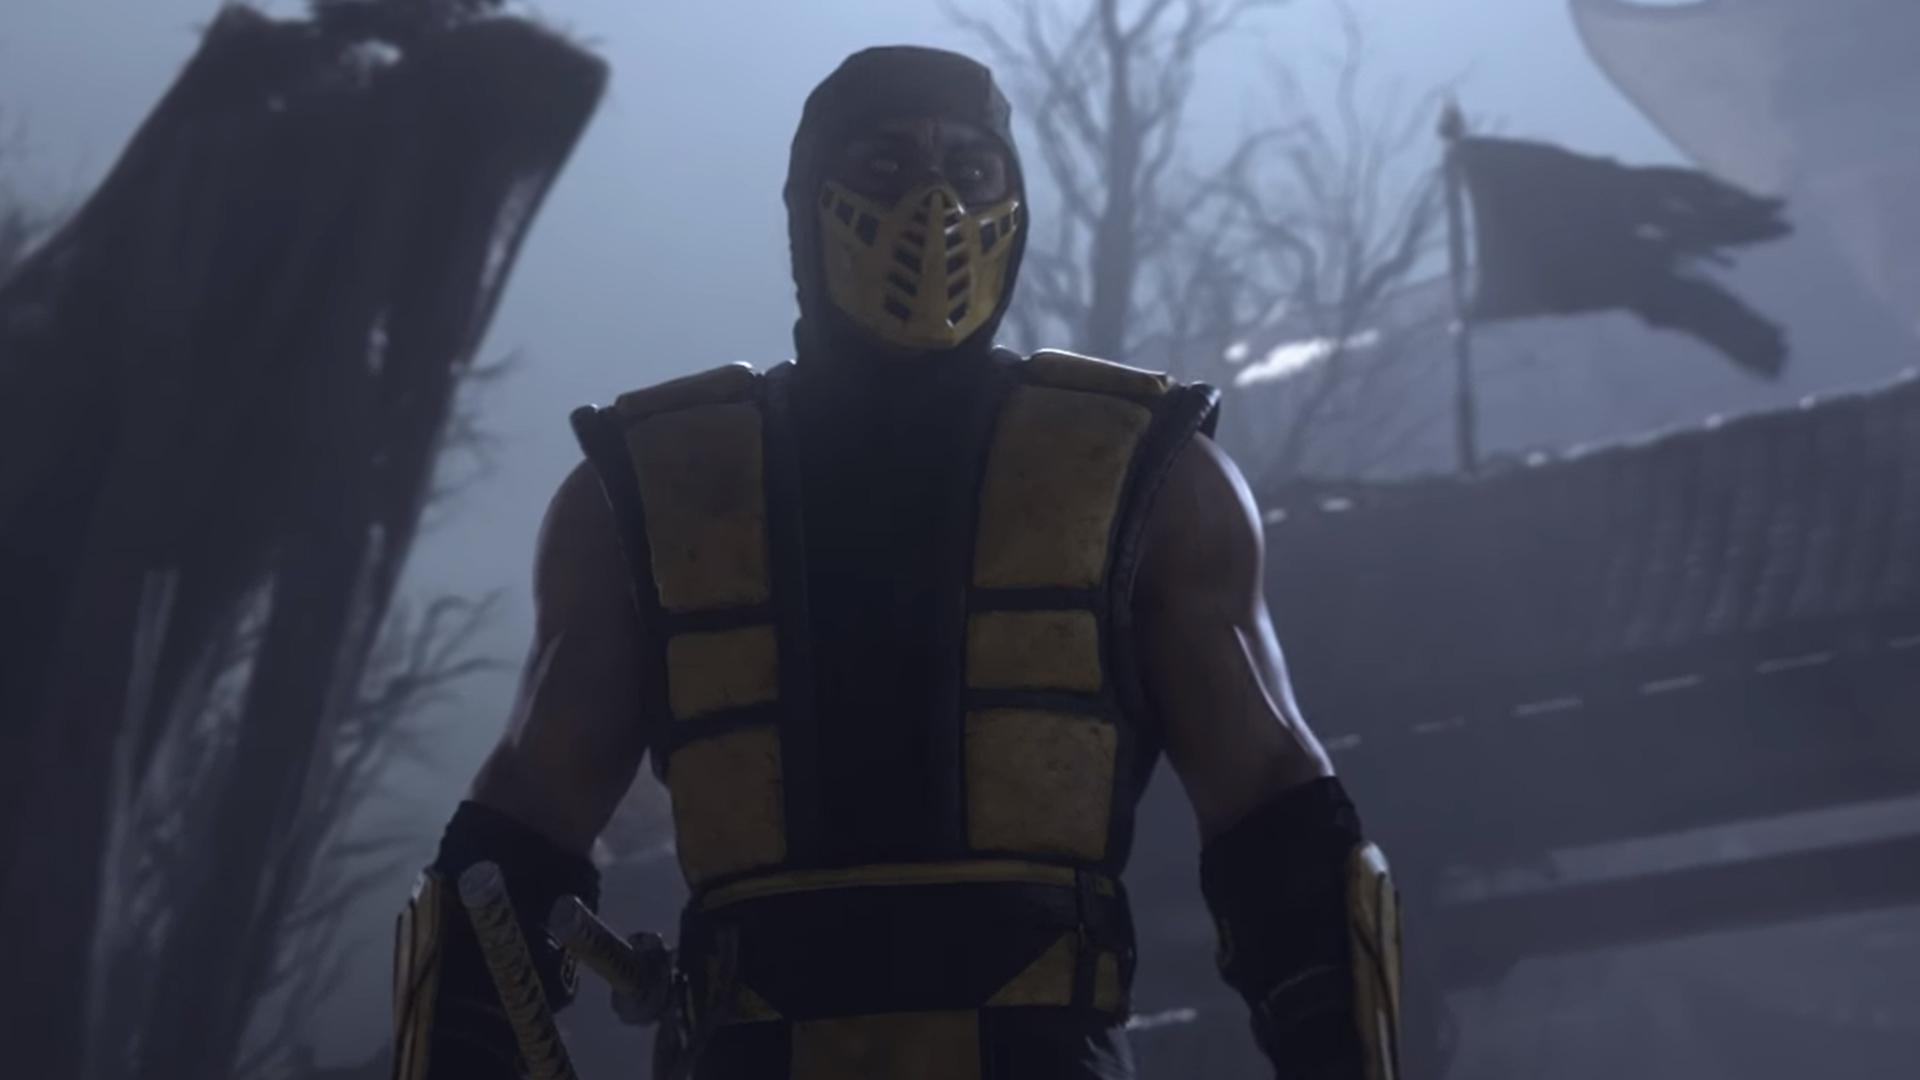 Upcoming pc games pcgamesn - Mortal kombat 11 wallpaper ...